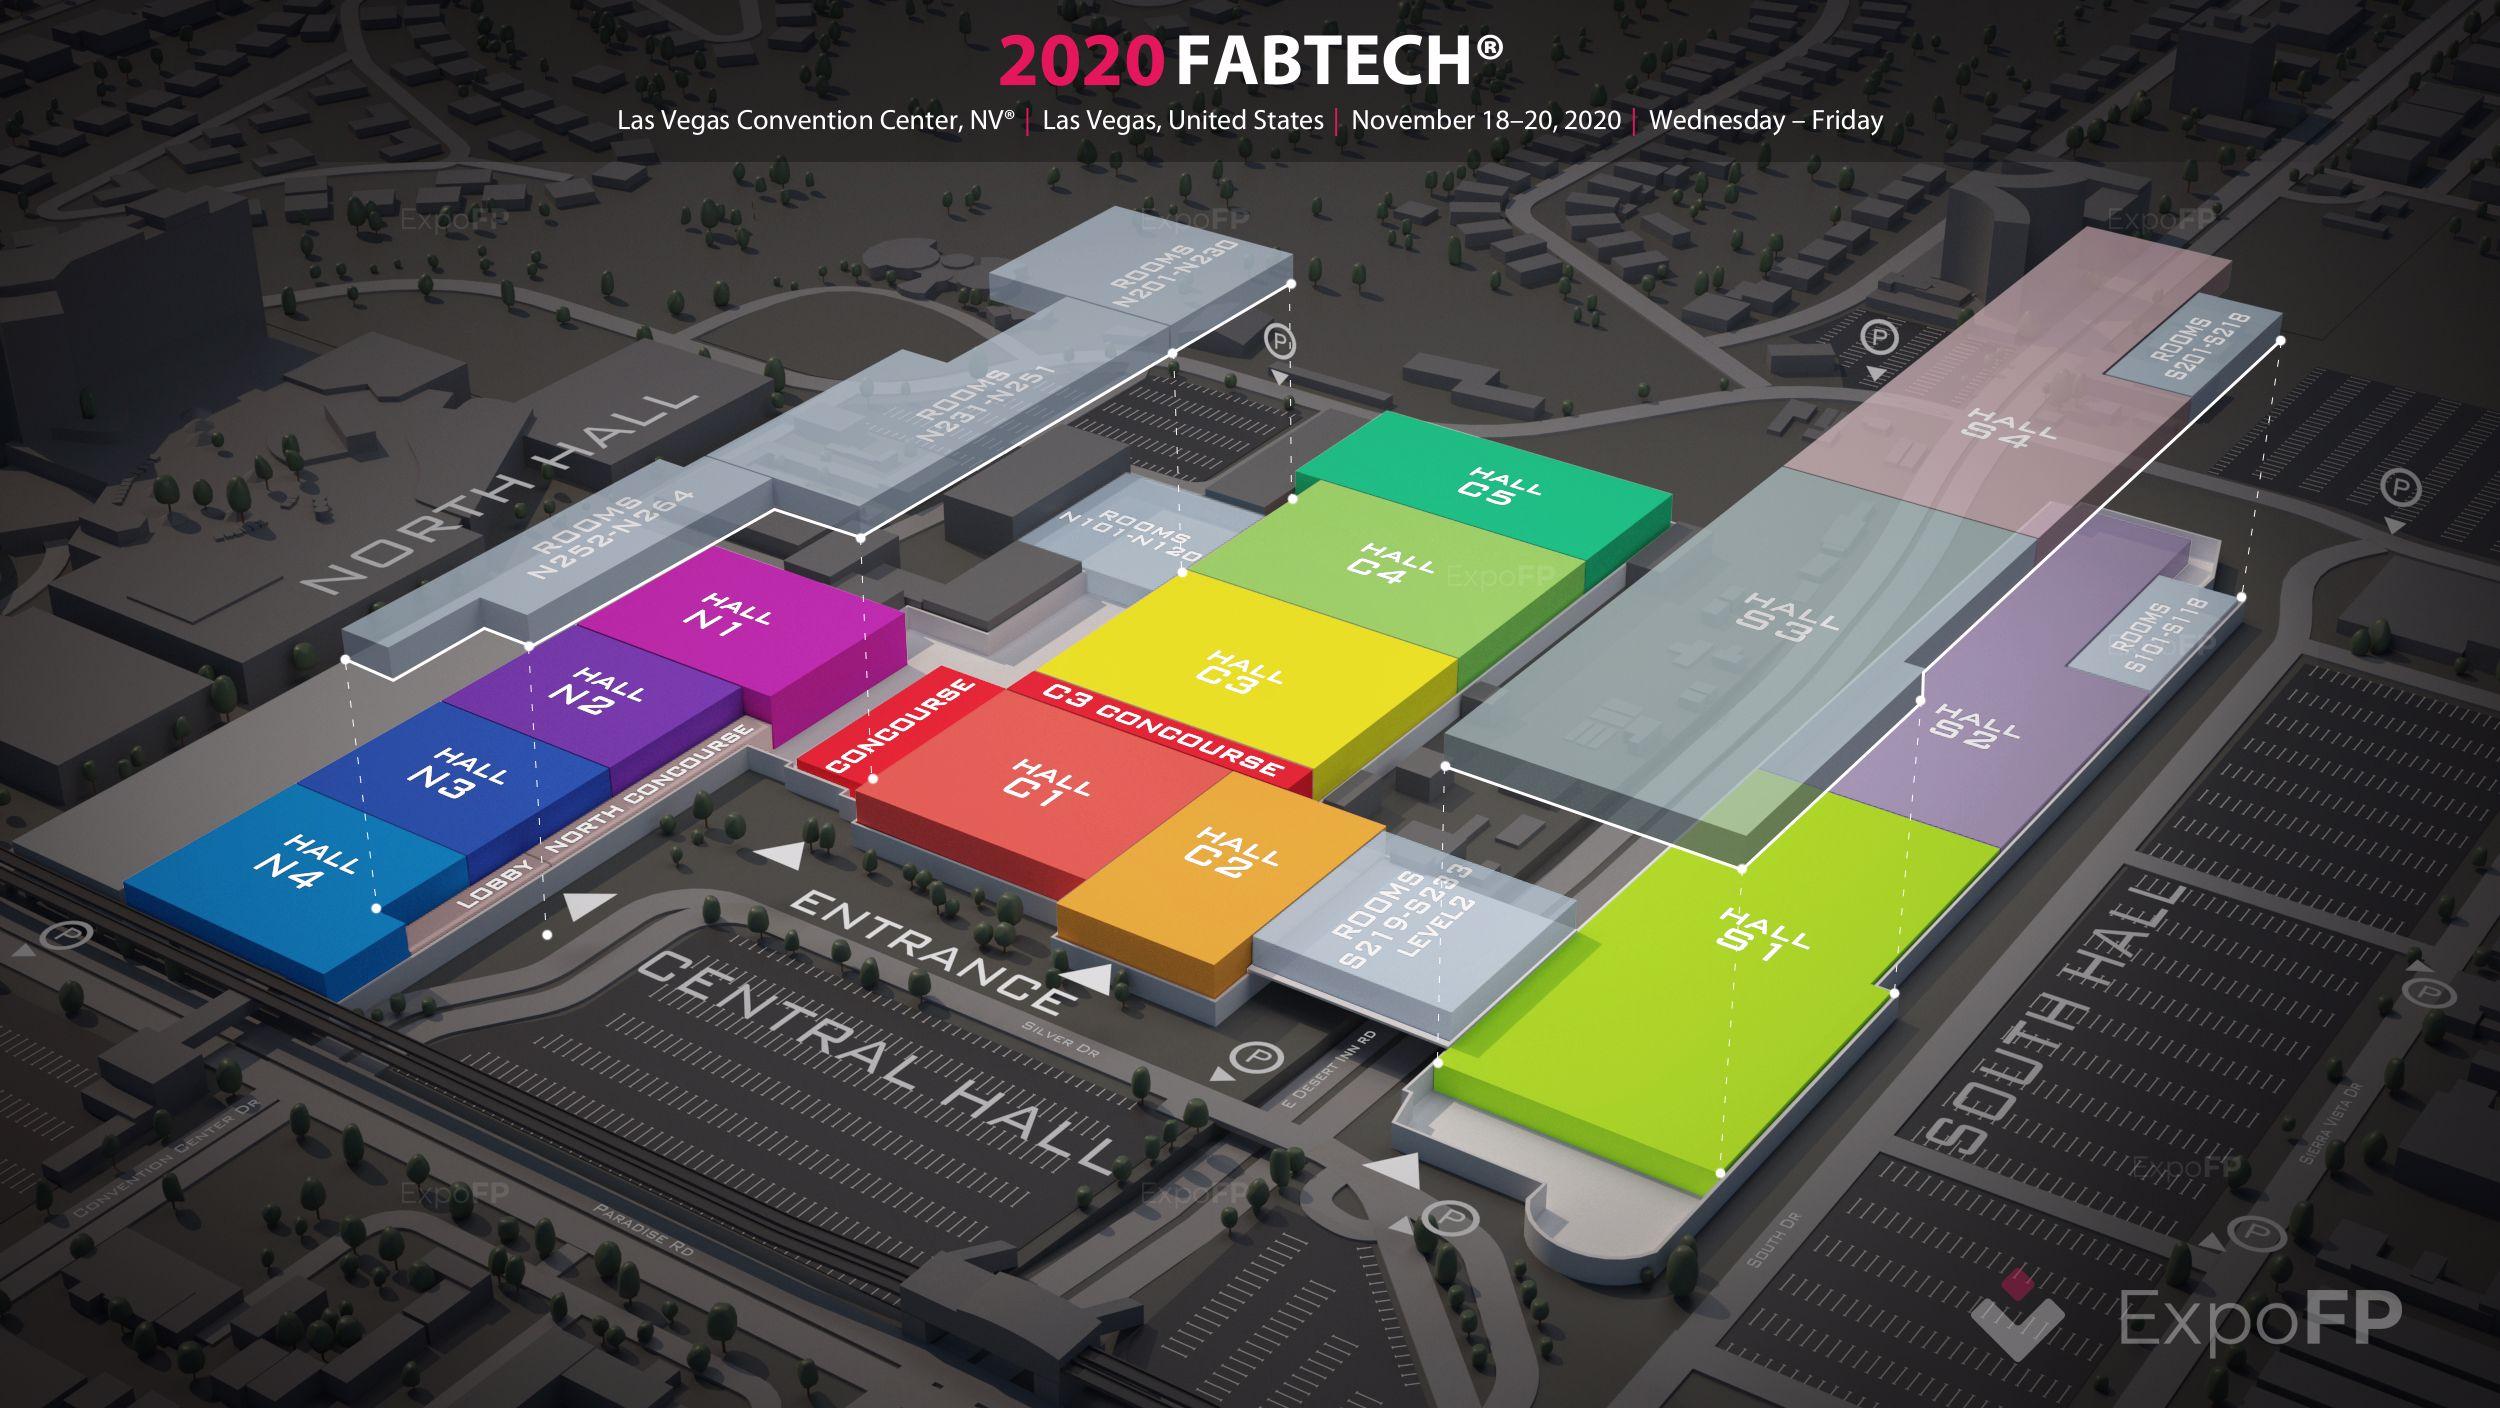 Fabtech 2020 las vegas | las vegas convention center floorplan | fabtech 2020